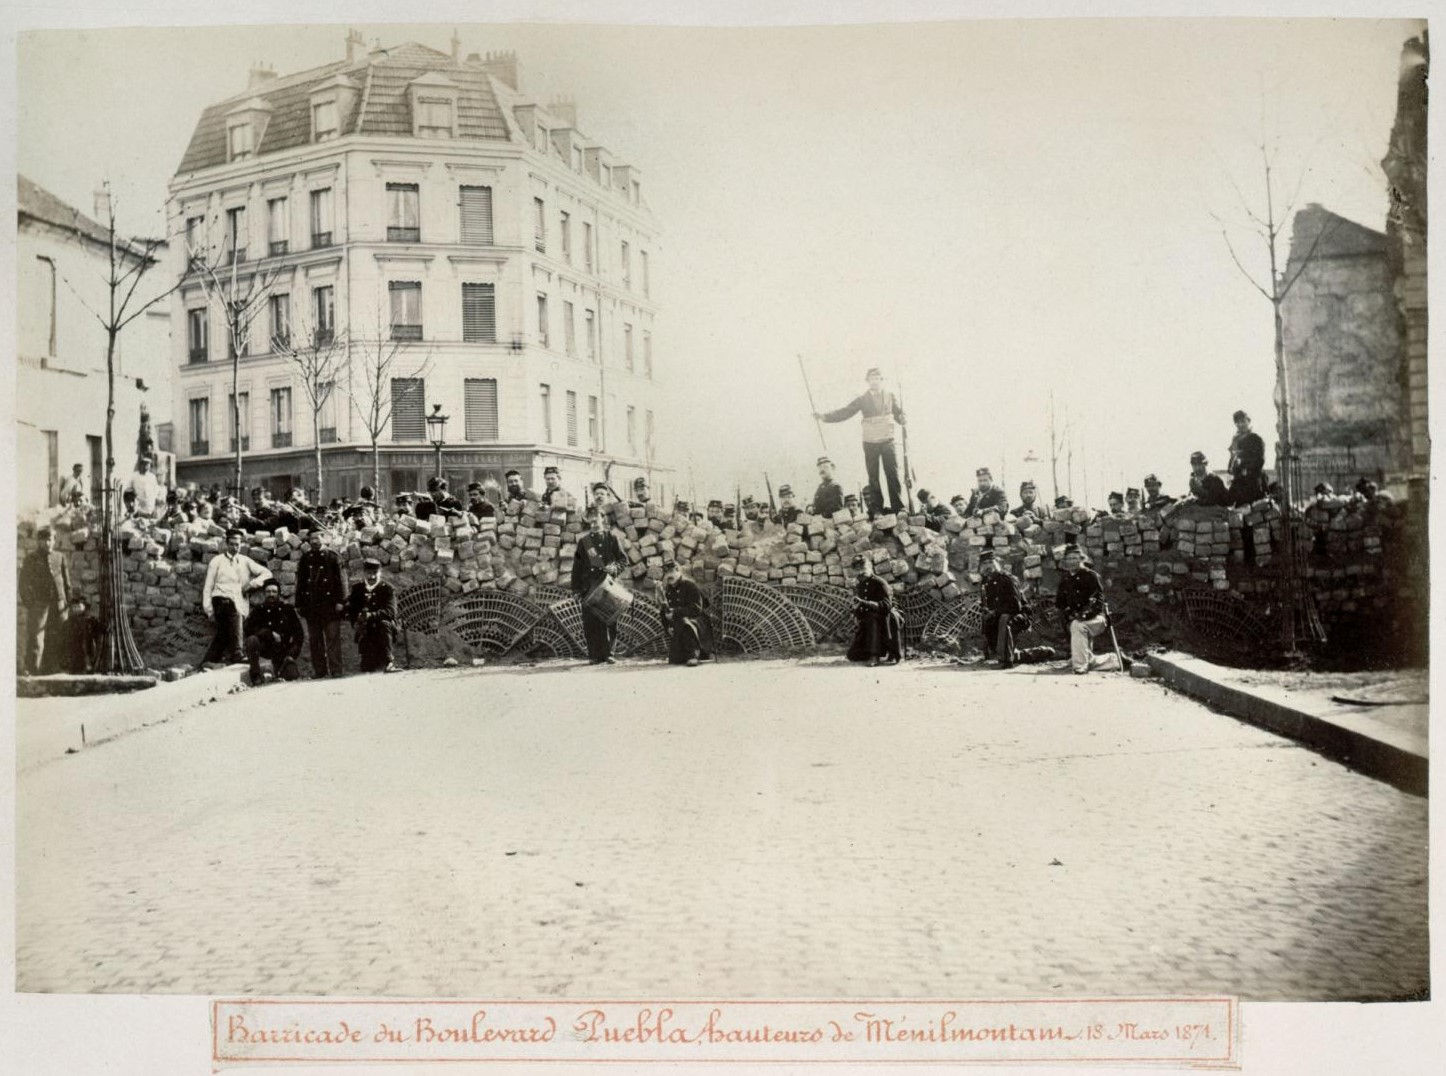 18 марта 1871. Баррикада на бульваре Пуэбла